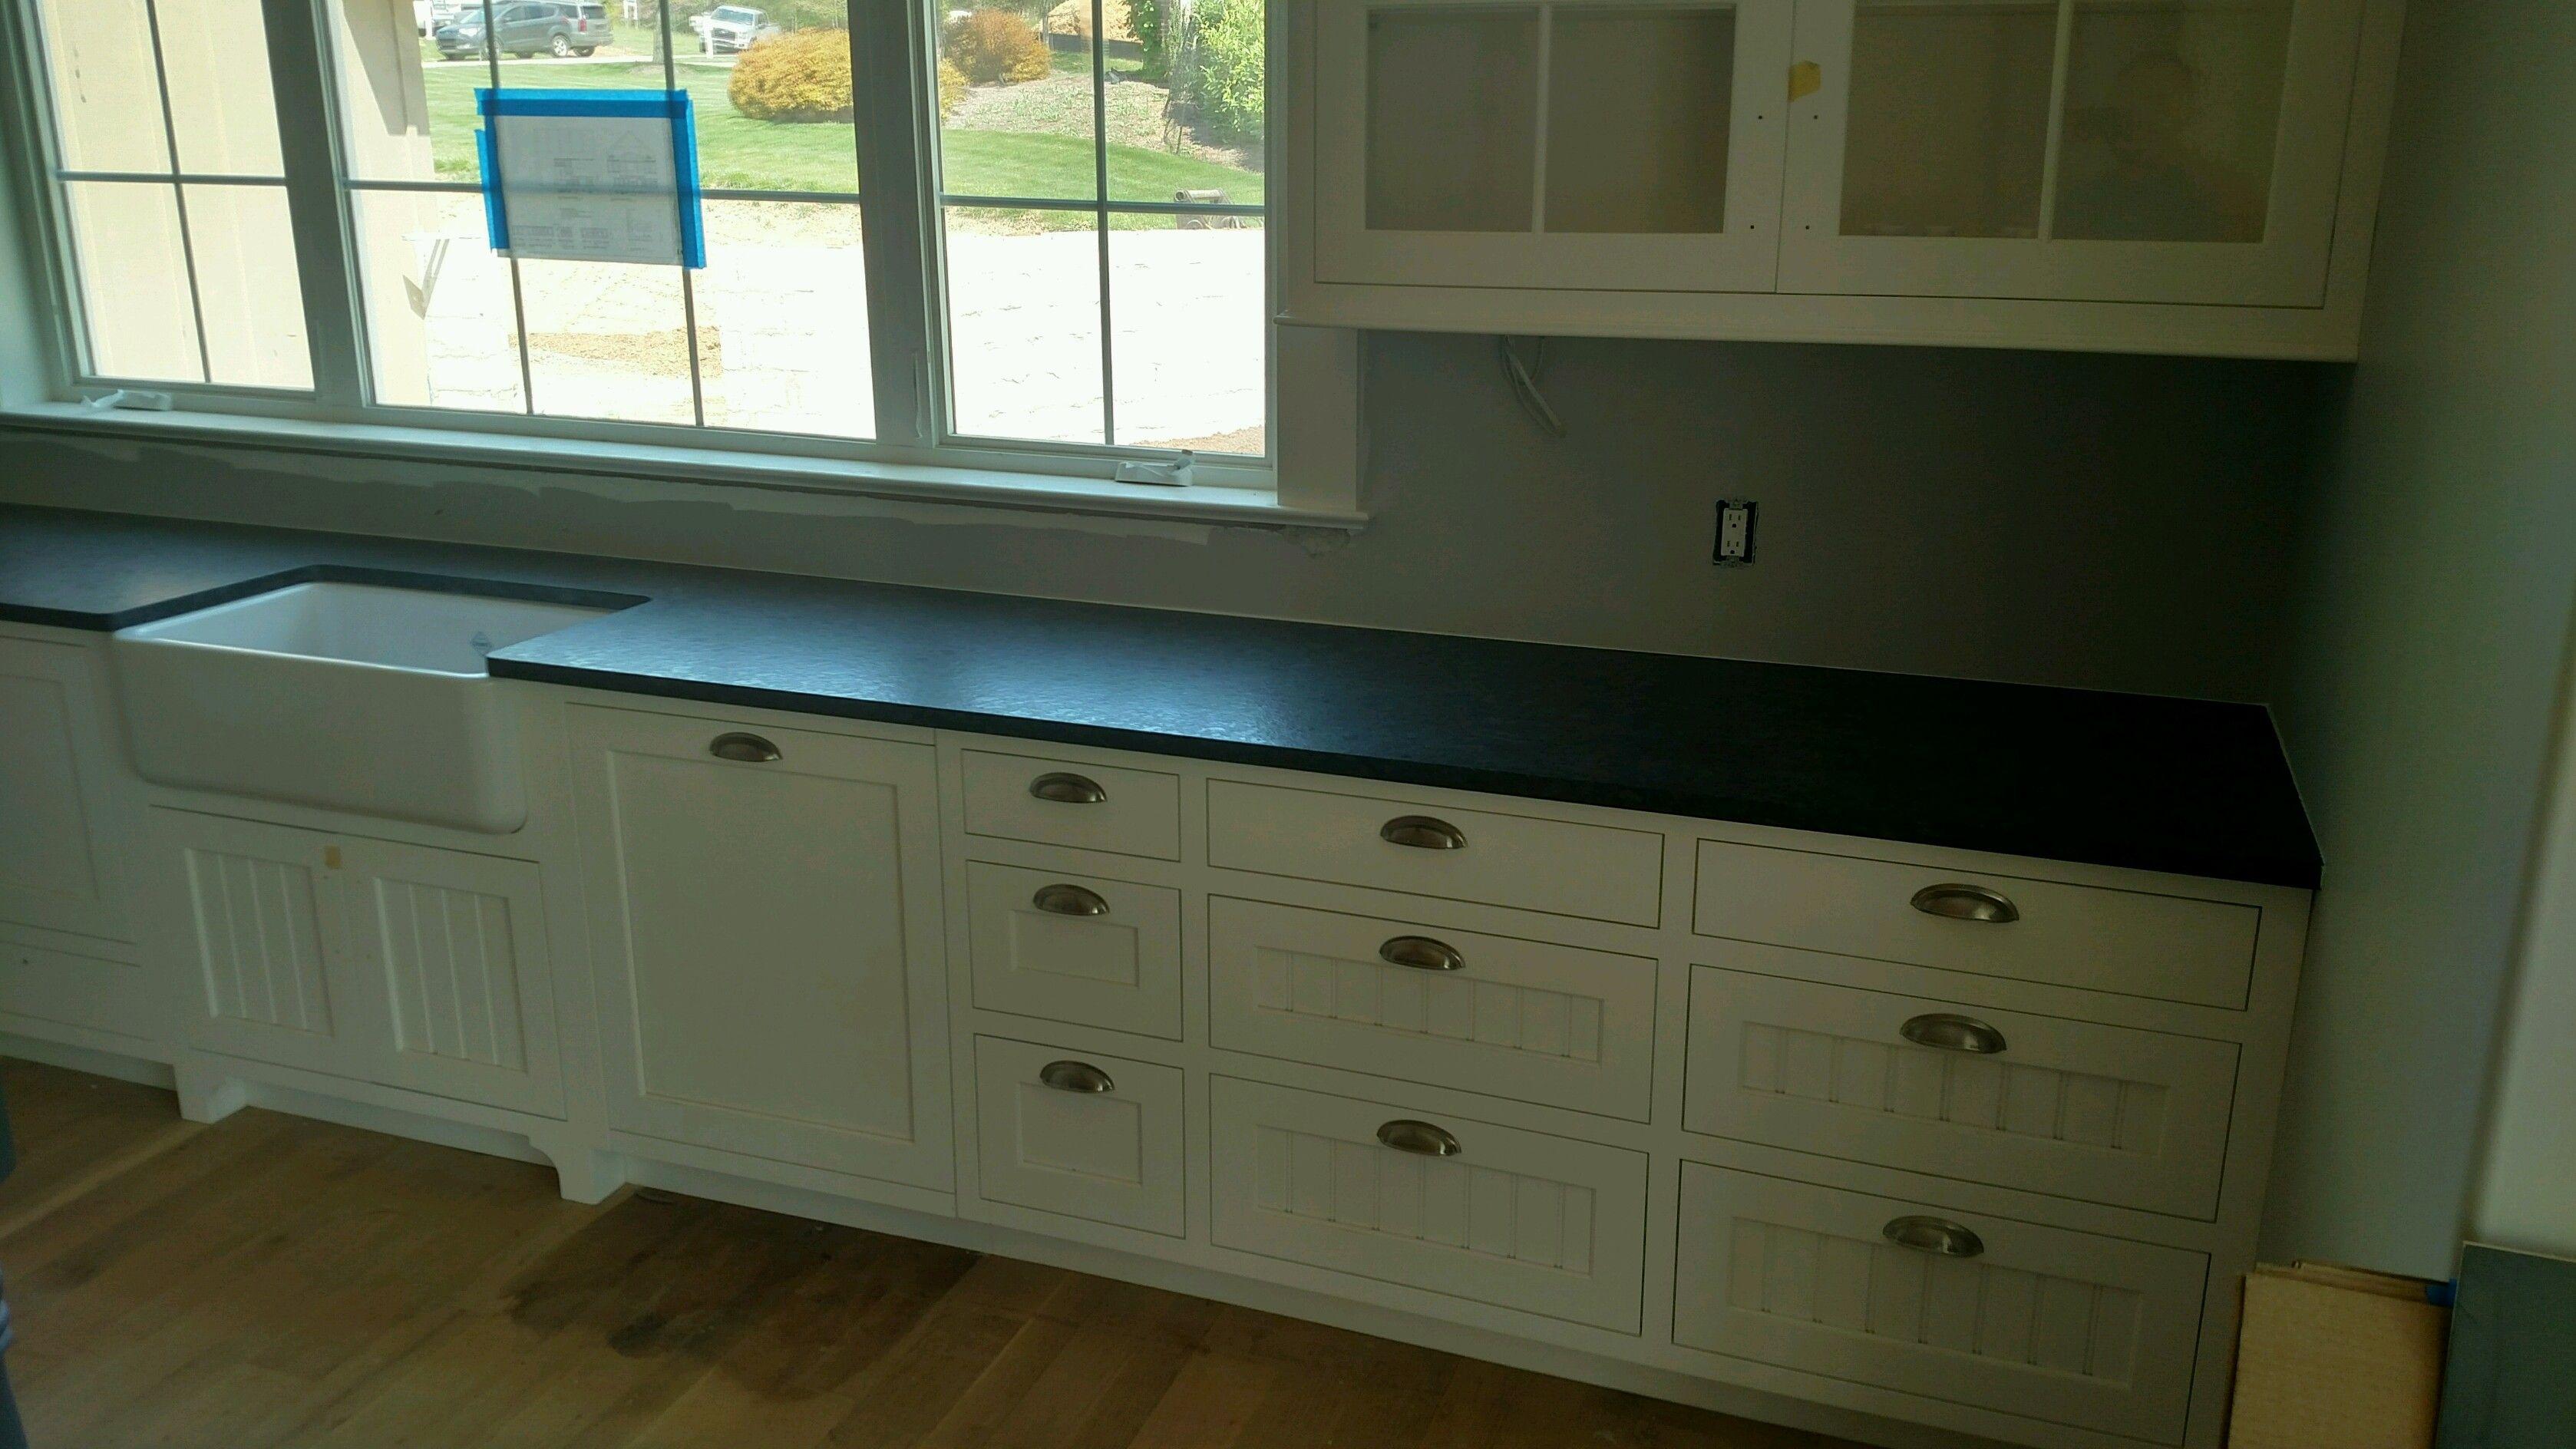 Best Steel Gray Leather Granite Kitchen Granite Countertops 400 x 300